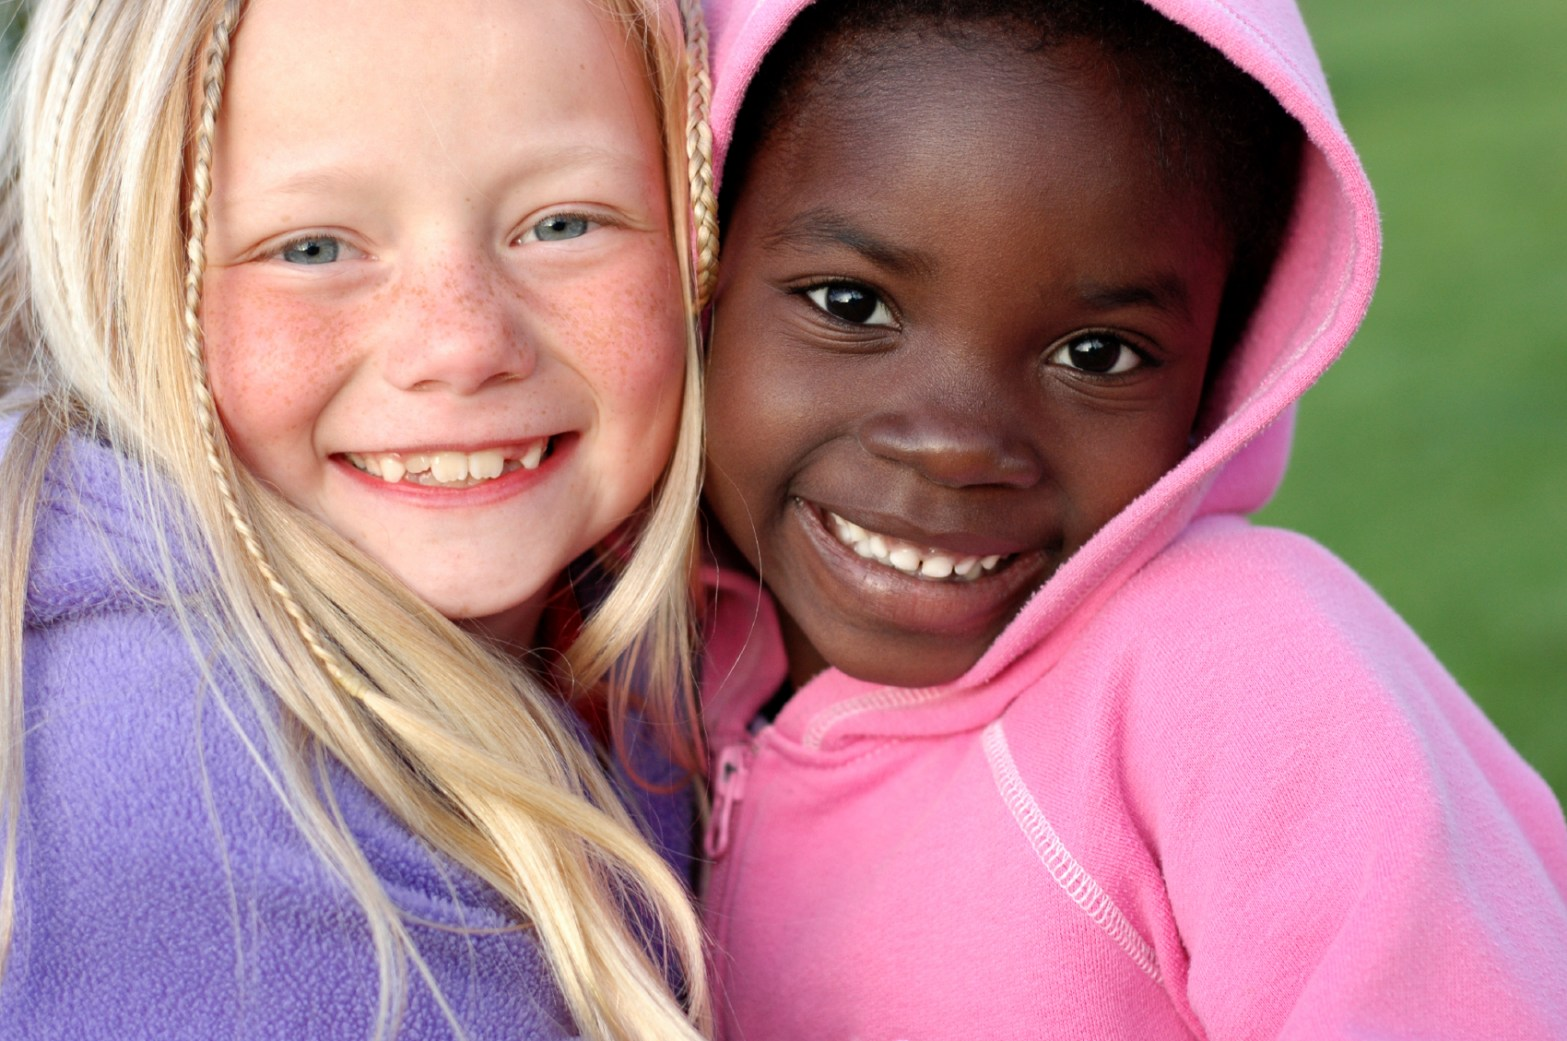 social-emotional development in children